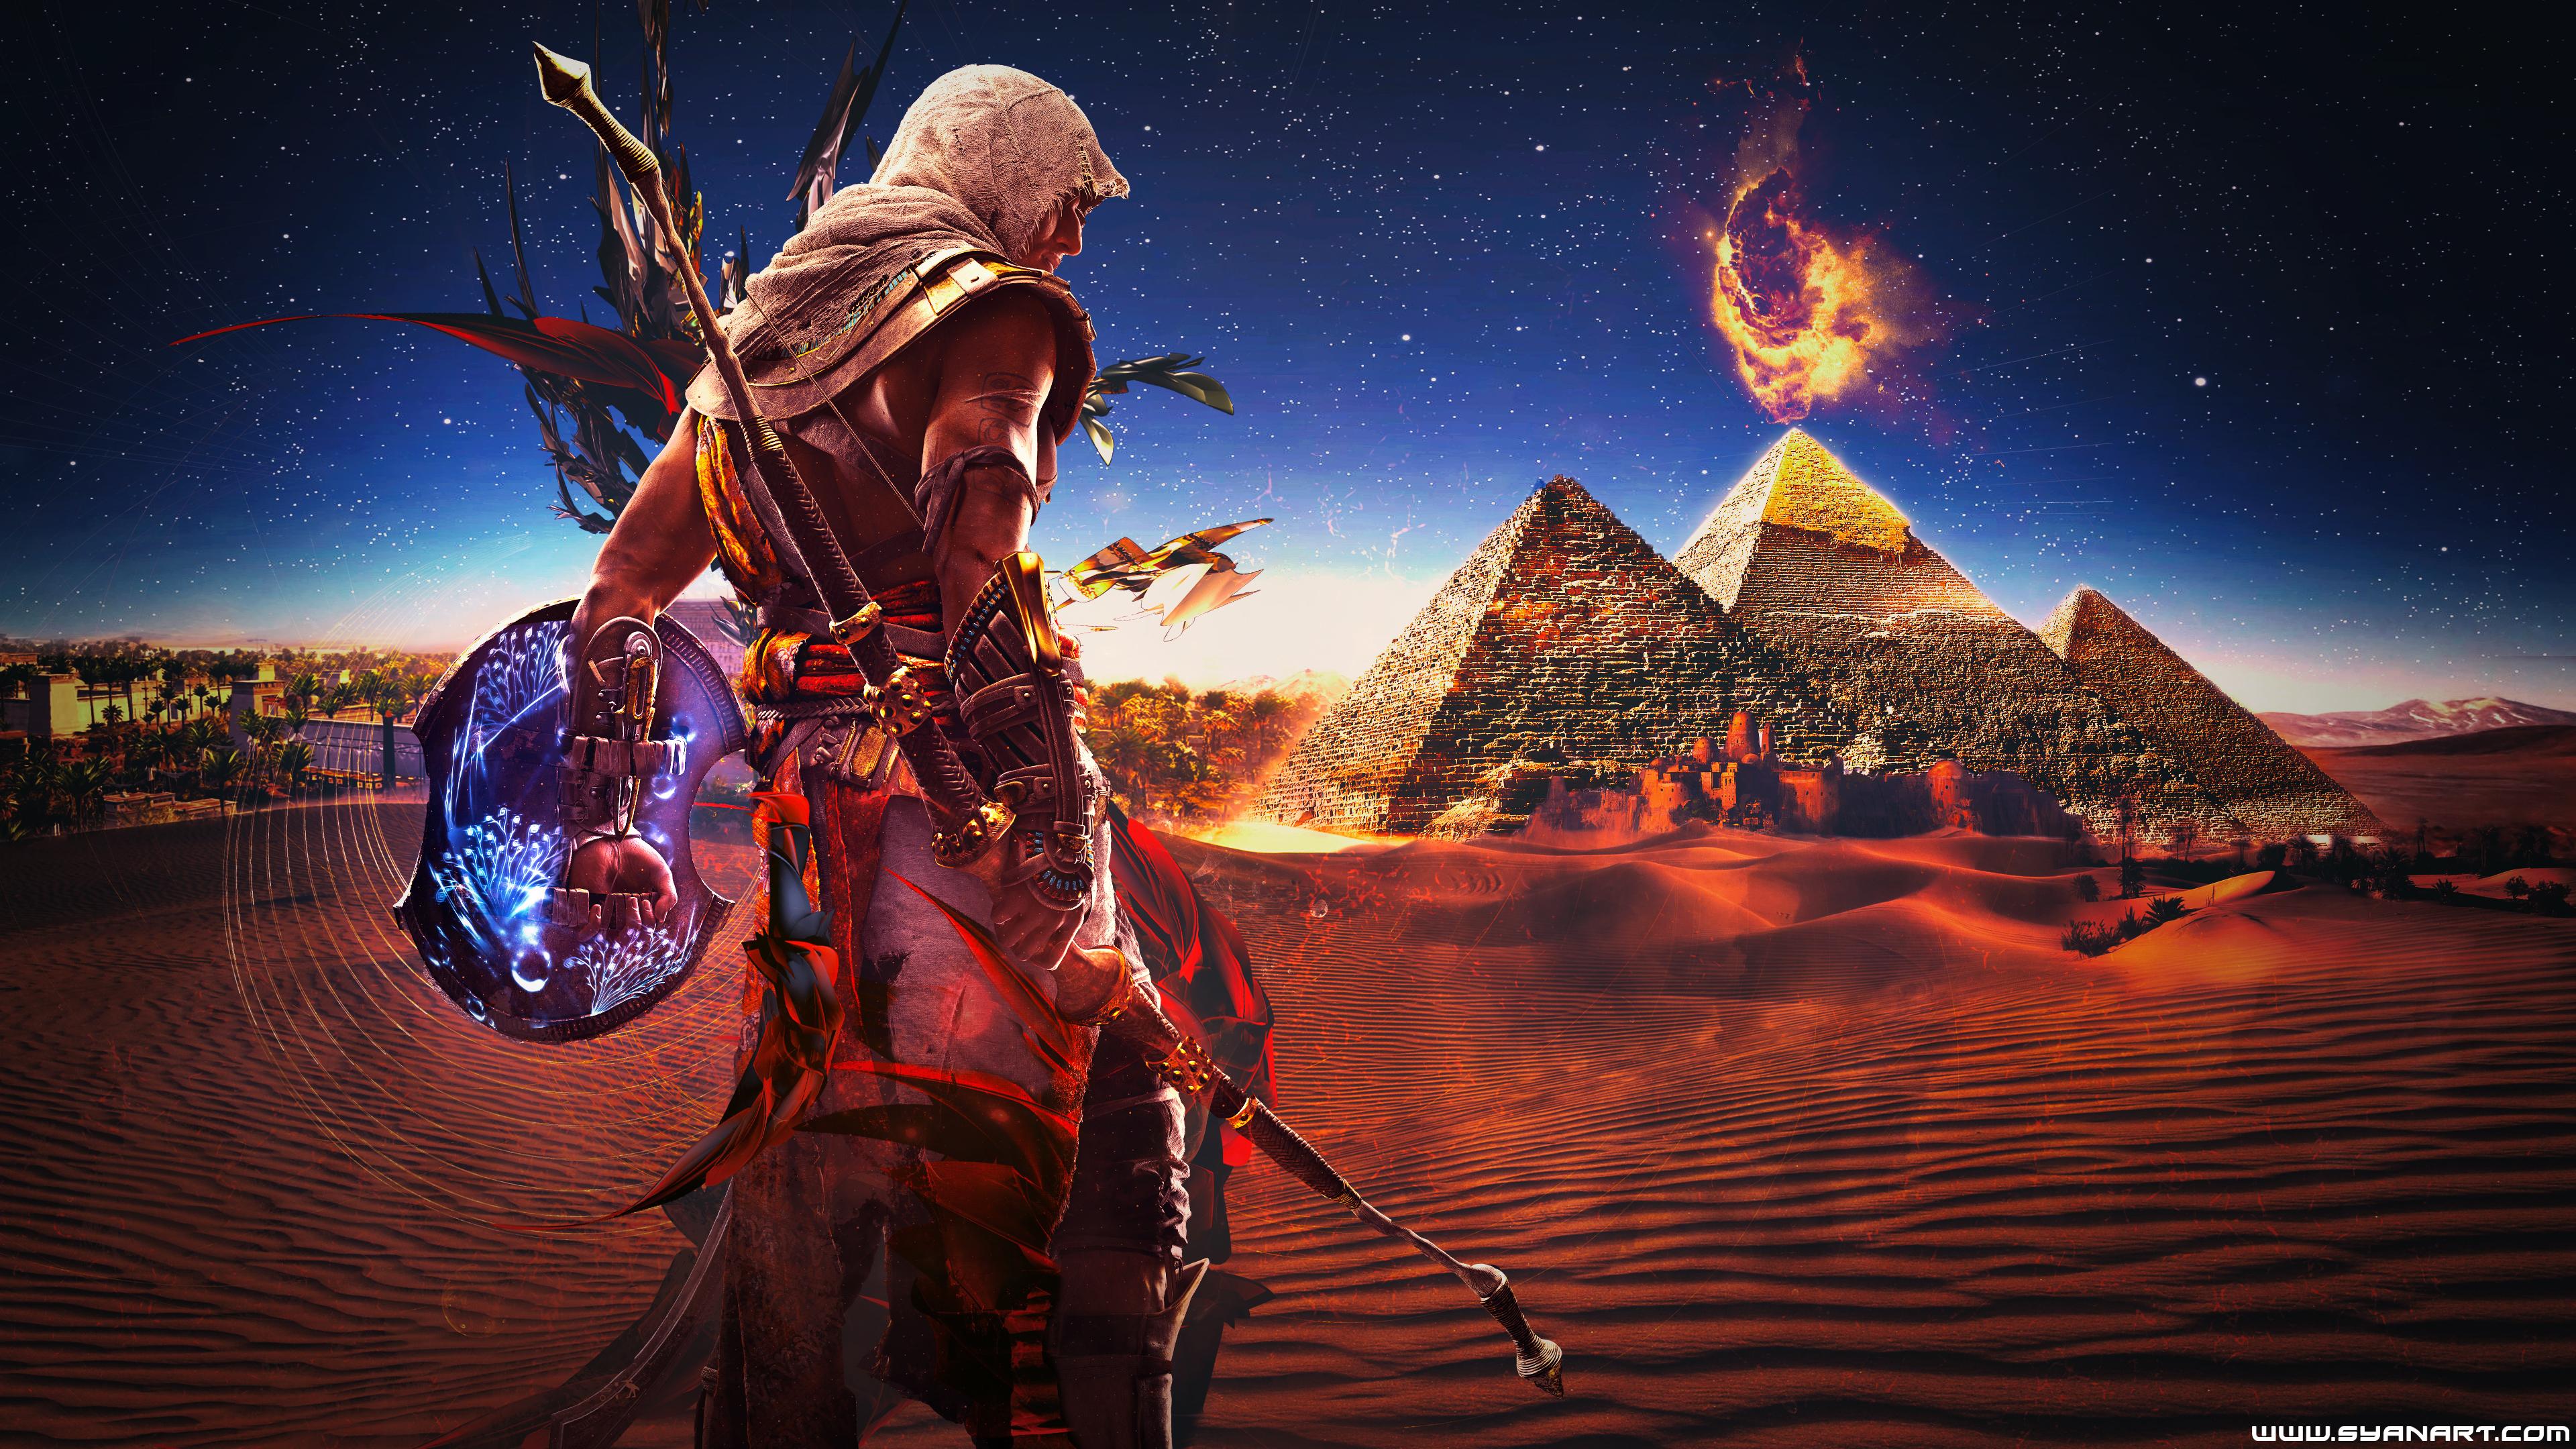 Assassin S Creed Origins 4k Bayek Wallpaper Syanart Station